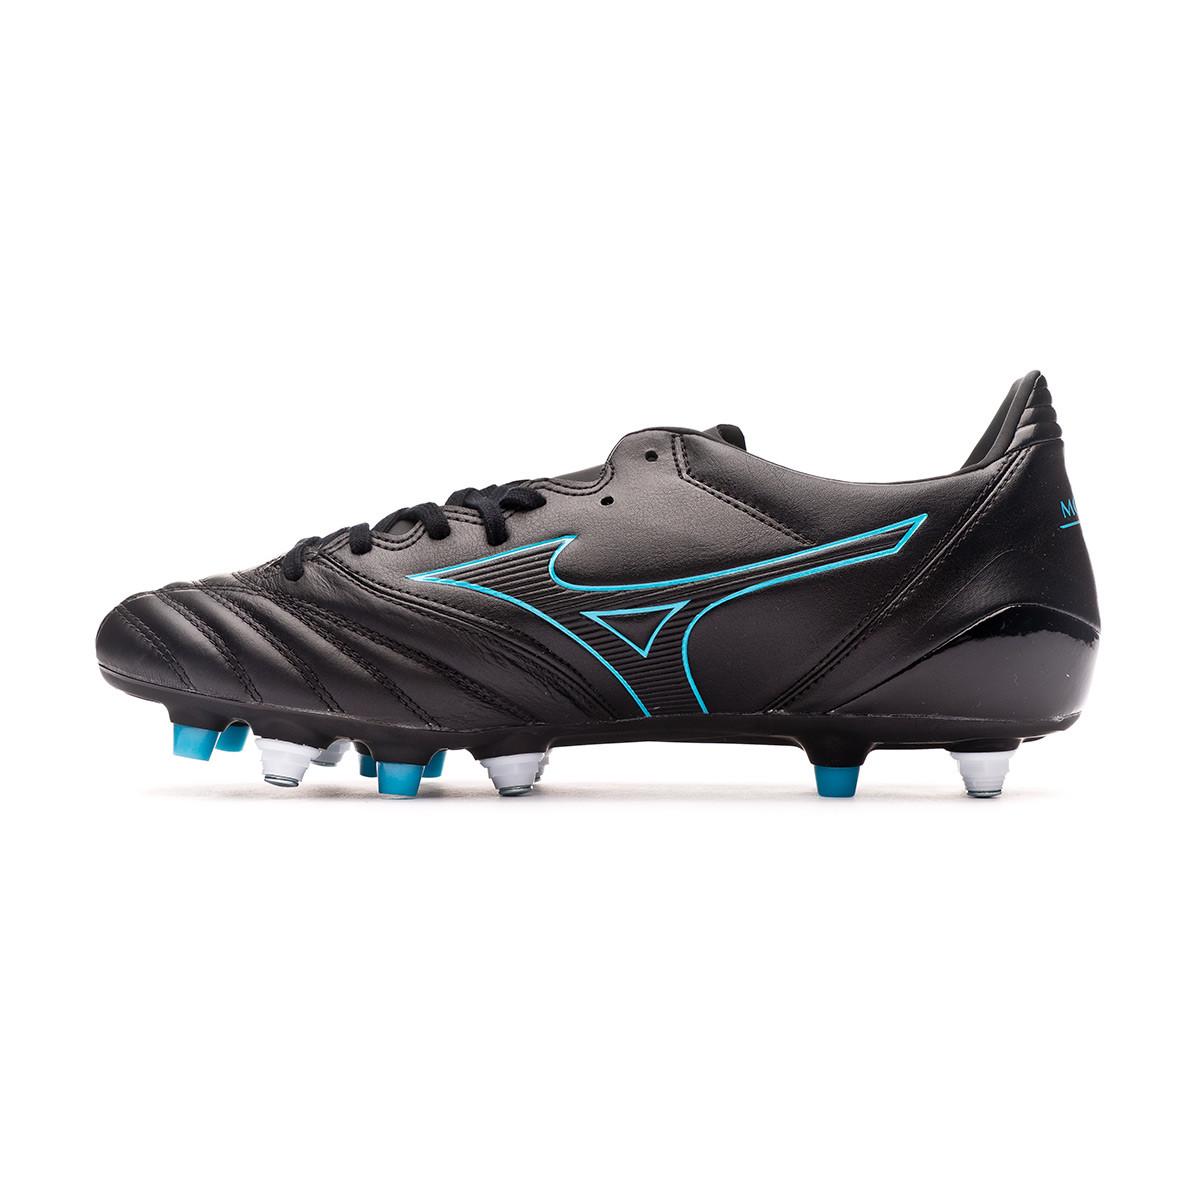 haut de gamme véritable la meilleure attitude emballage fort Chaussure de foot Mizuno Morelia NEO KL II Mix